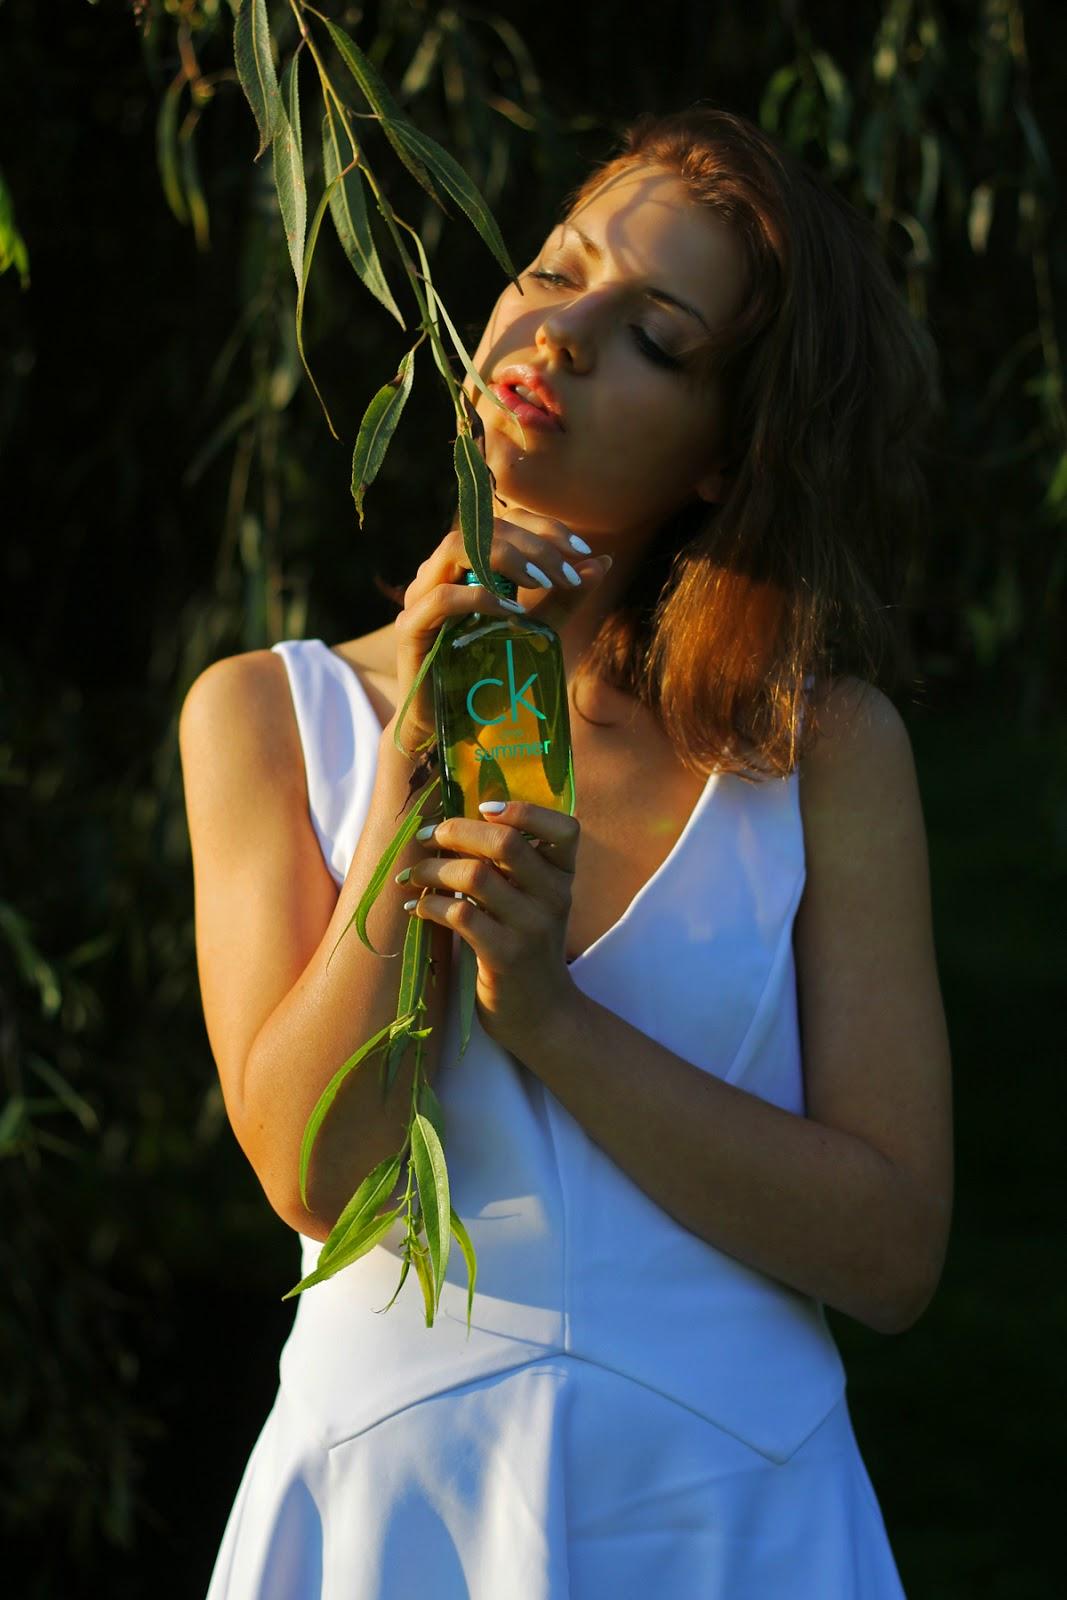 calvin klein perfume myberlinfashion shooting